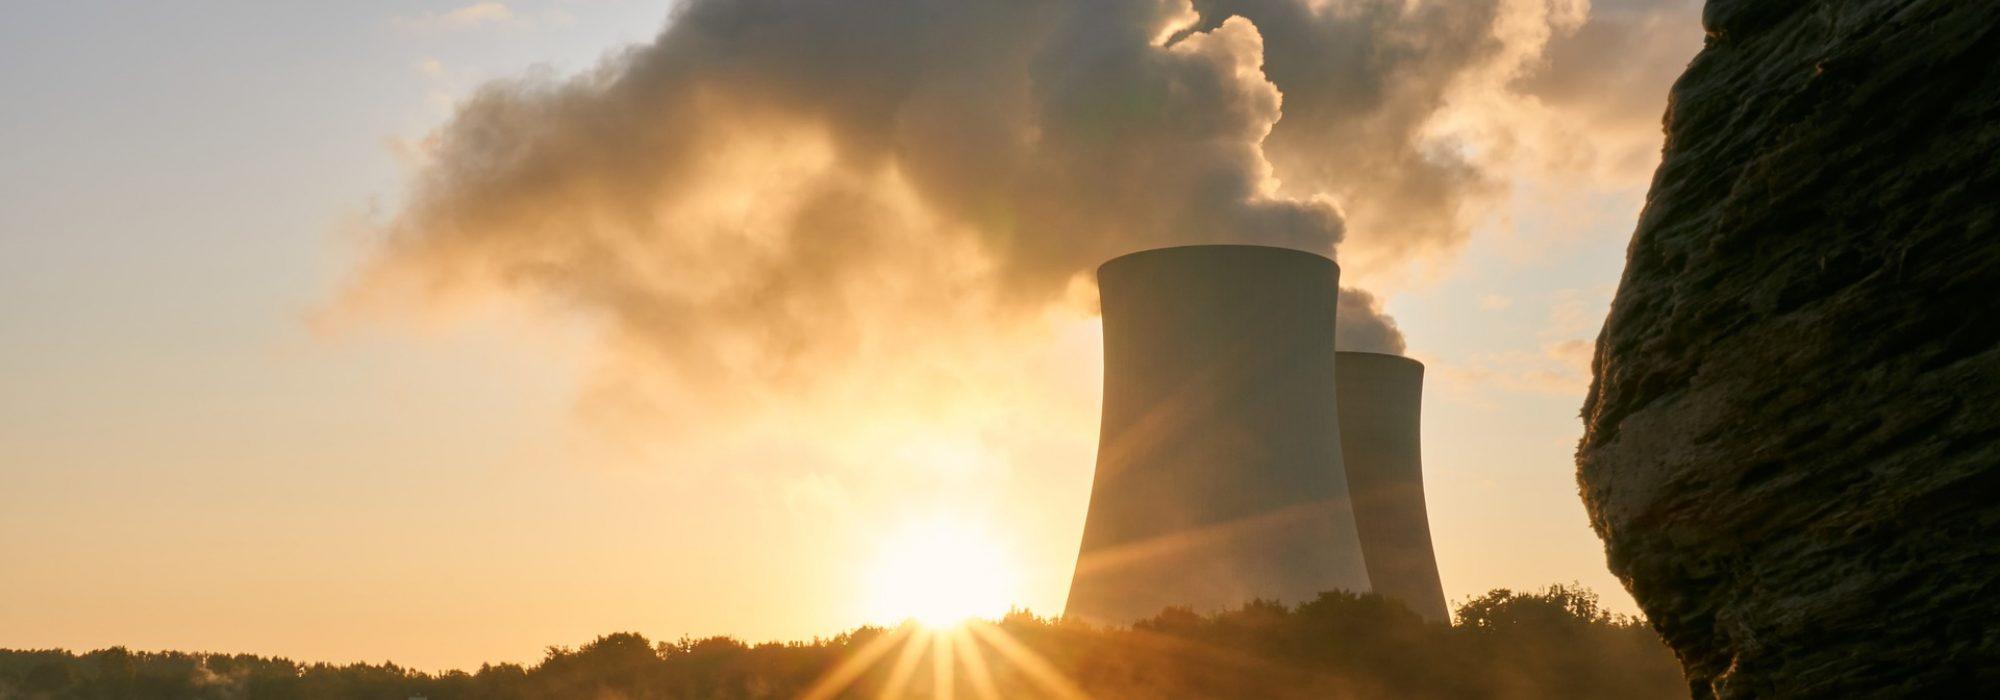 nuclear-power-plant-4535761_1920